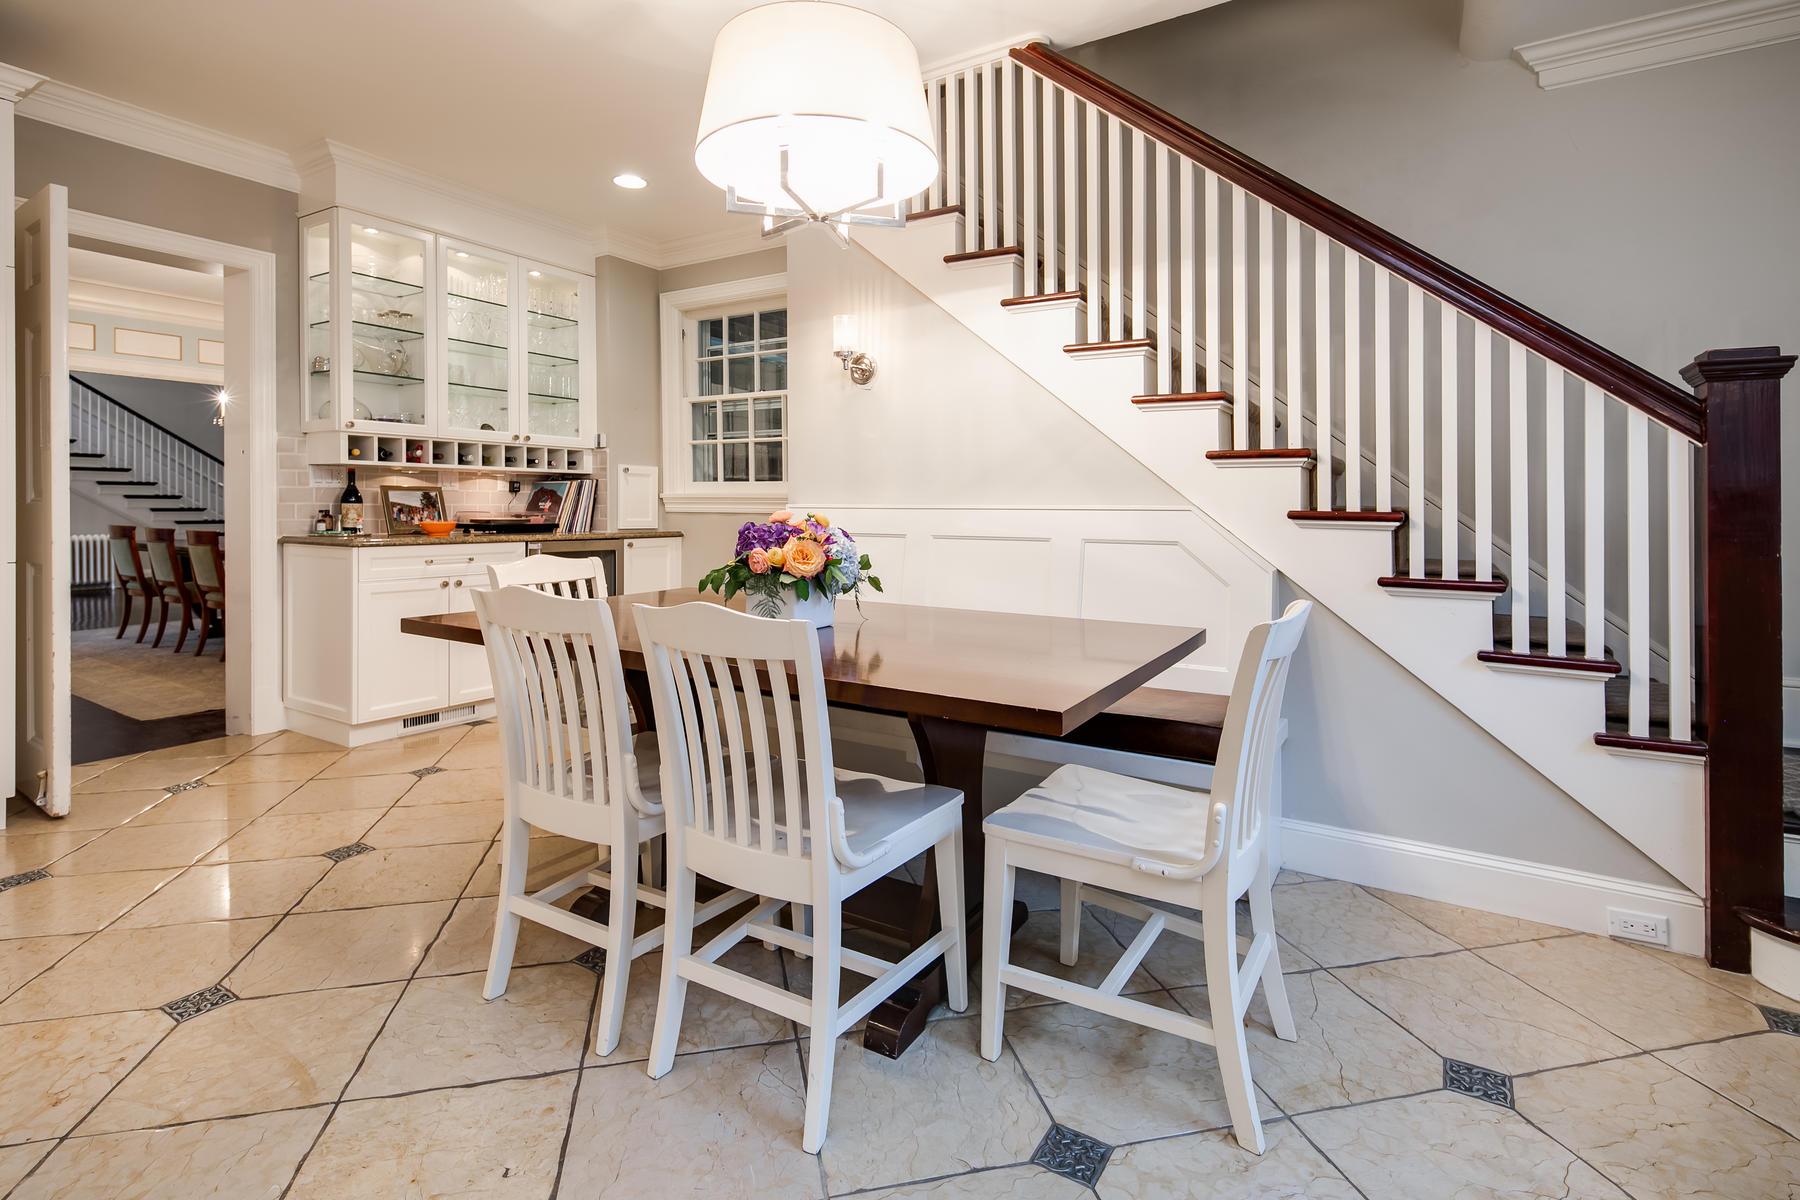 Additional photo for property listing at Elegant Georgian Estate 860 Vine St Denver, Colorado 80206 United States